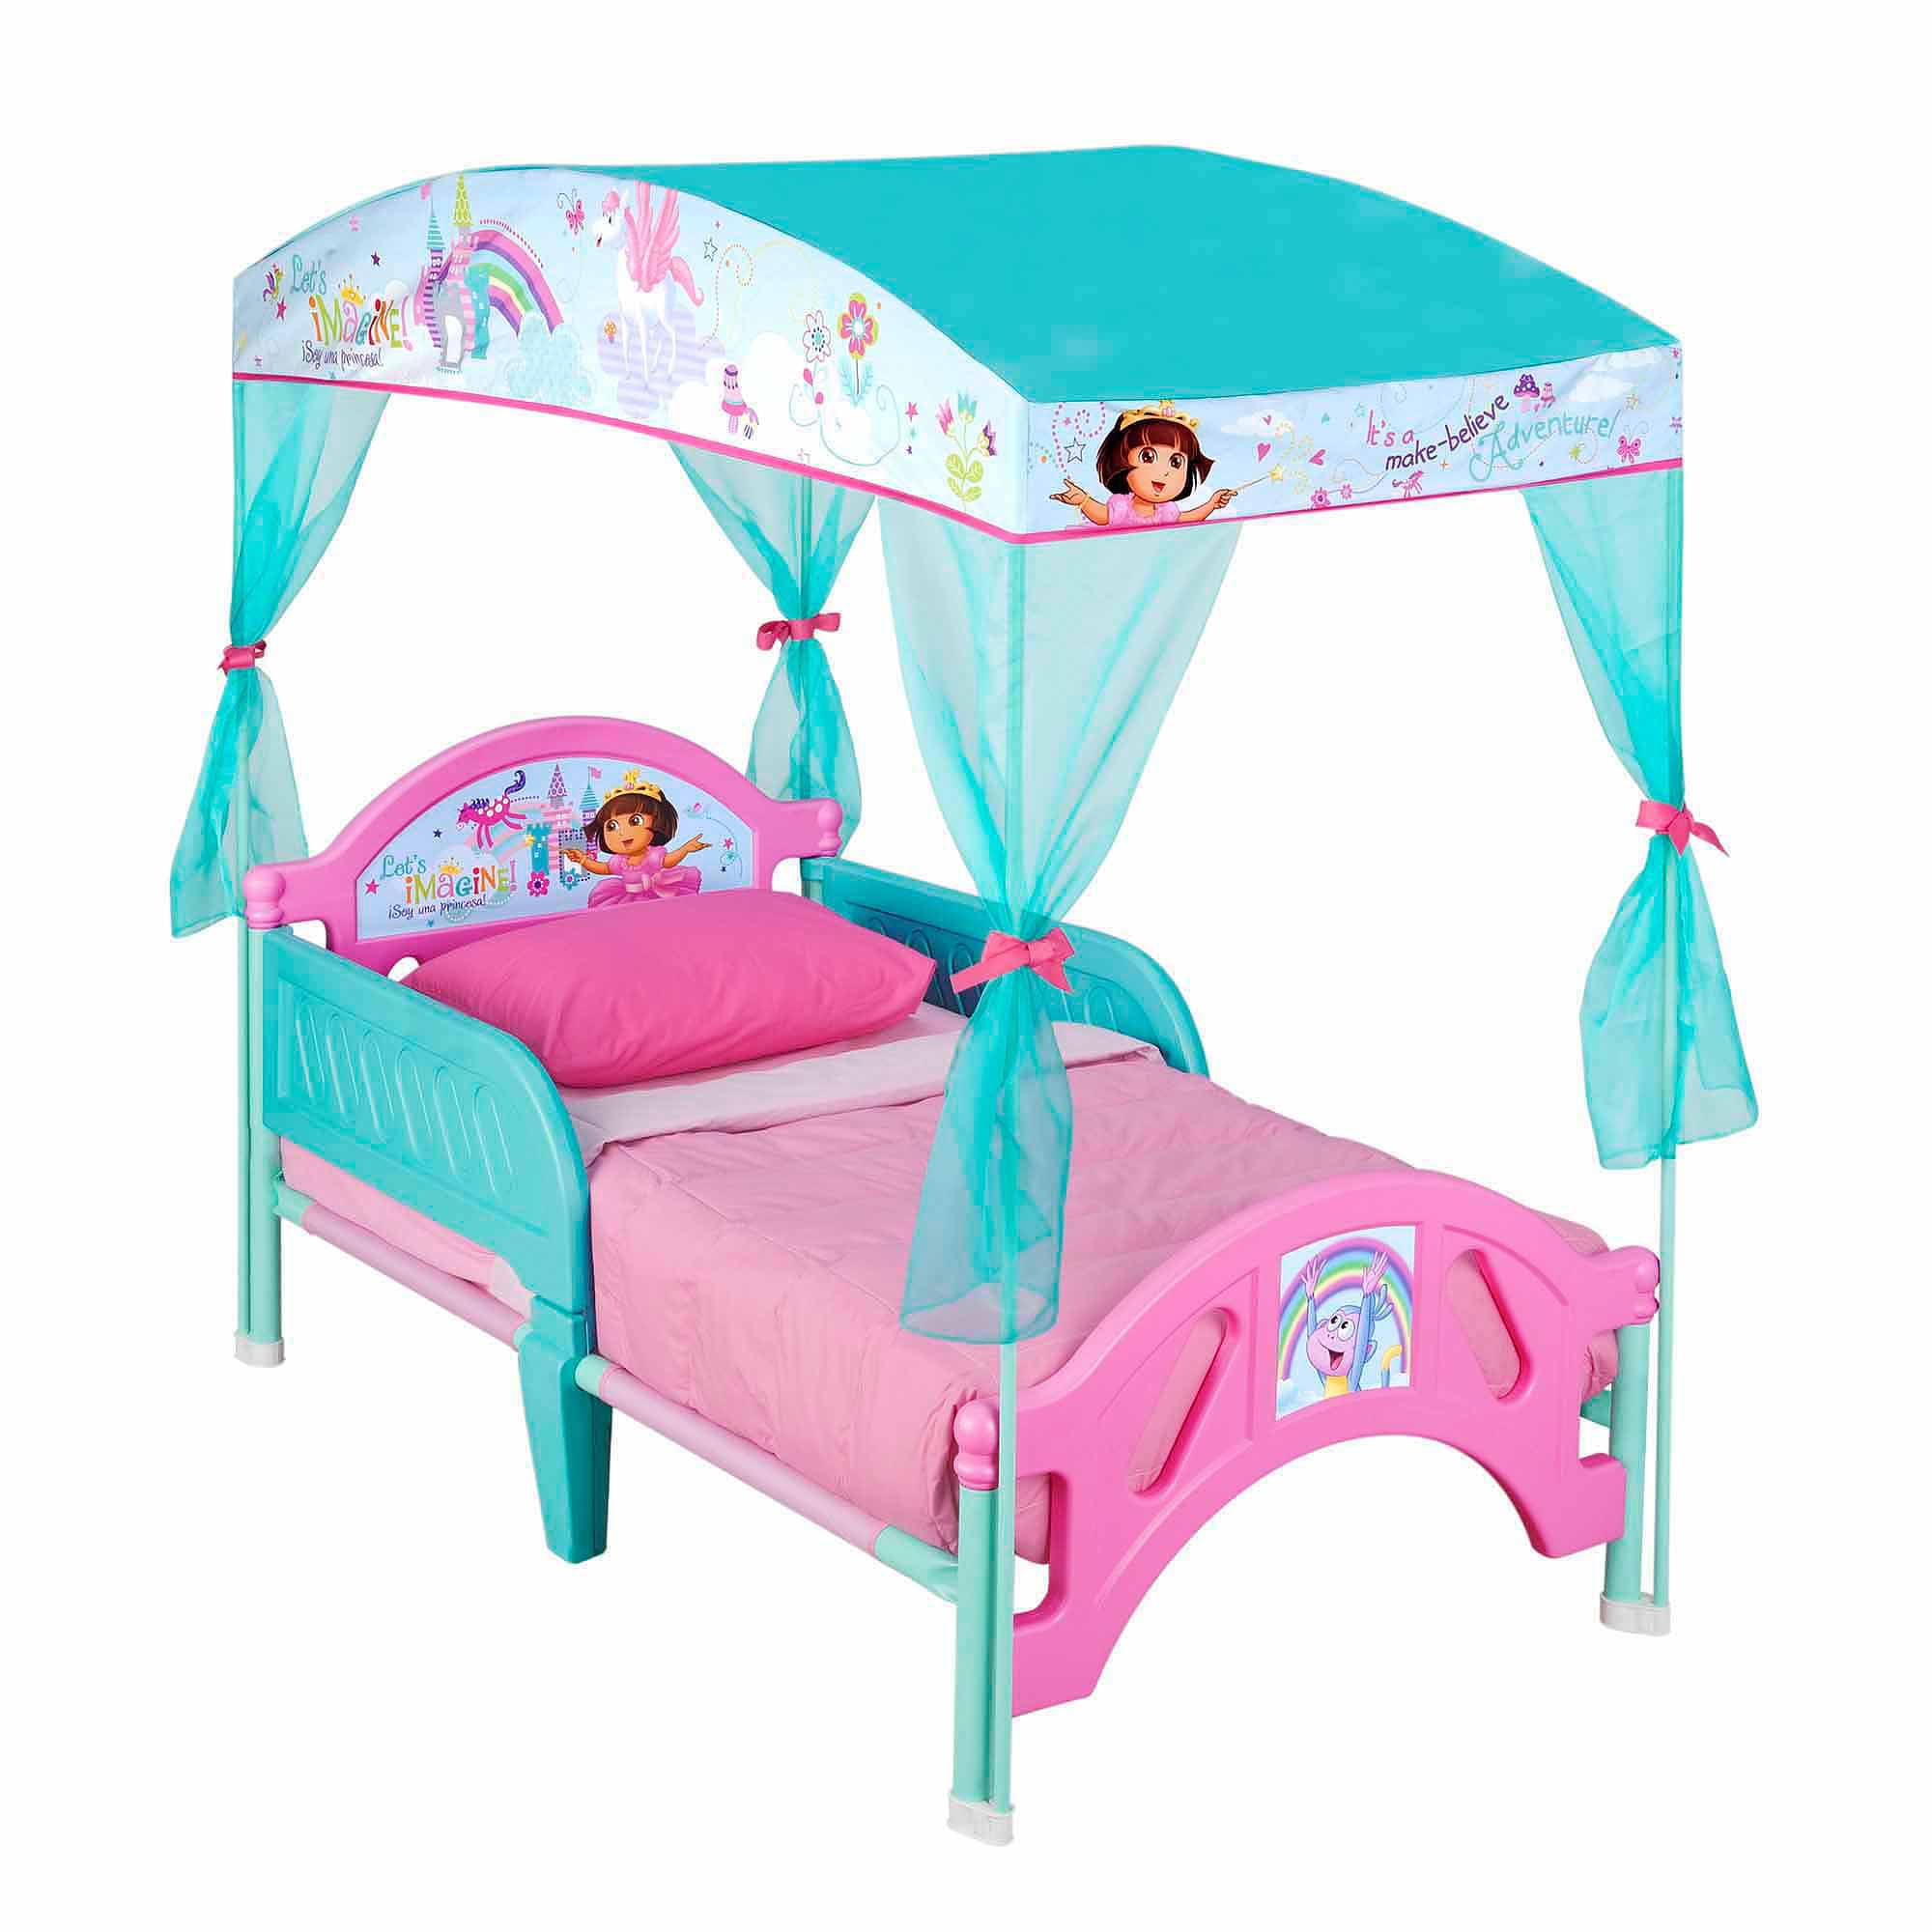 Nickelodeon Dora the Explorer Canopy Toddler Bed